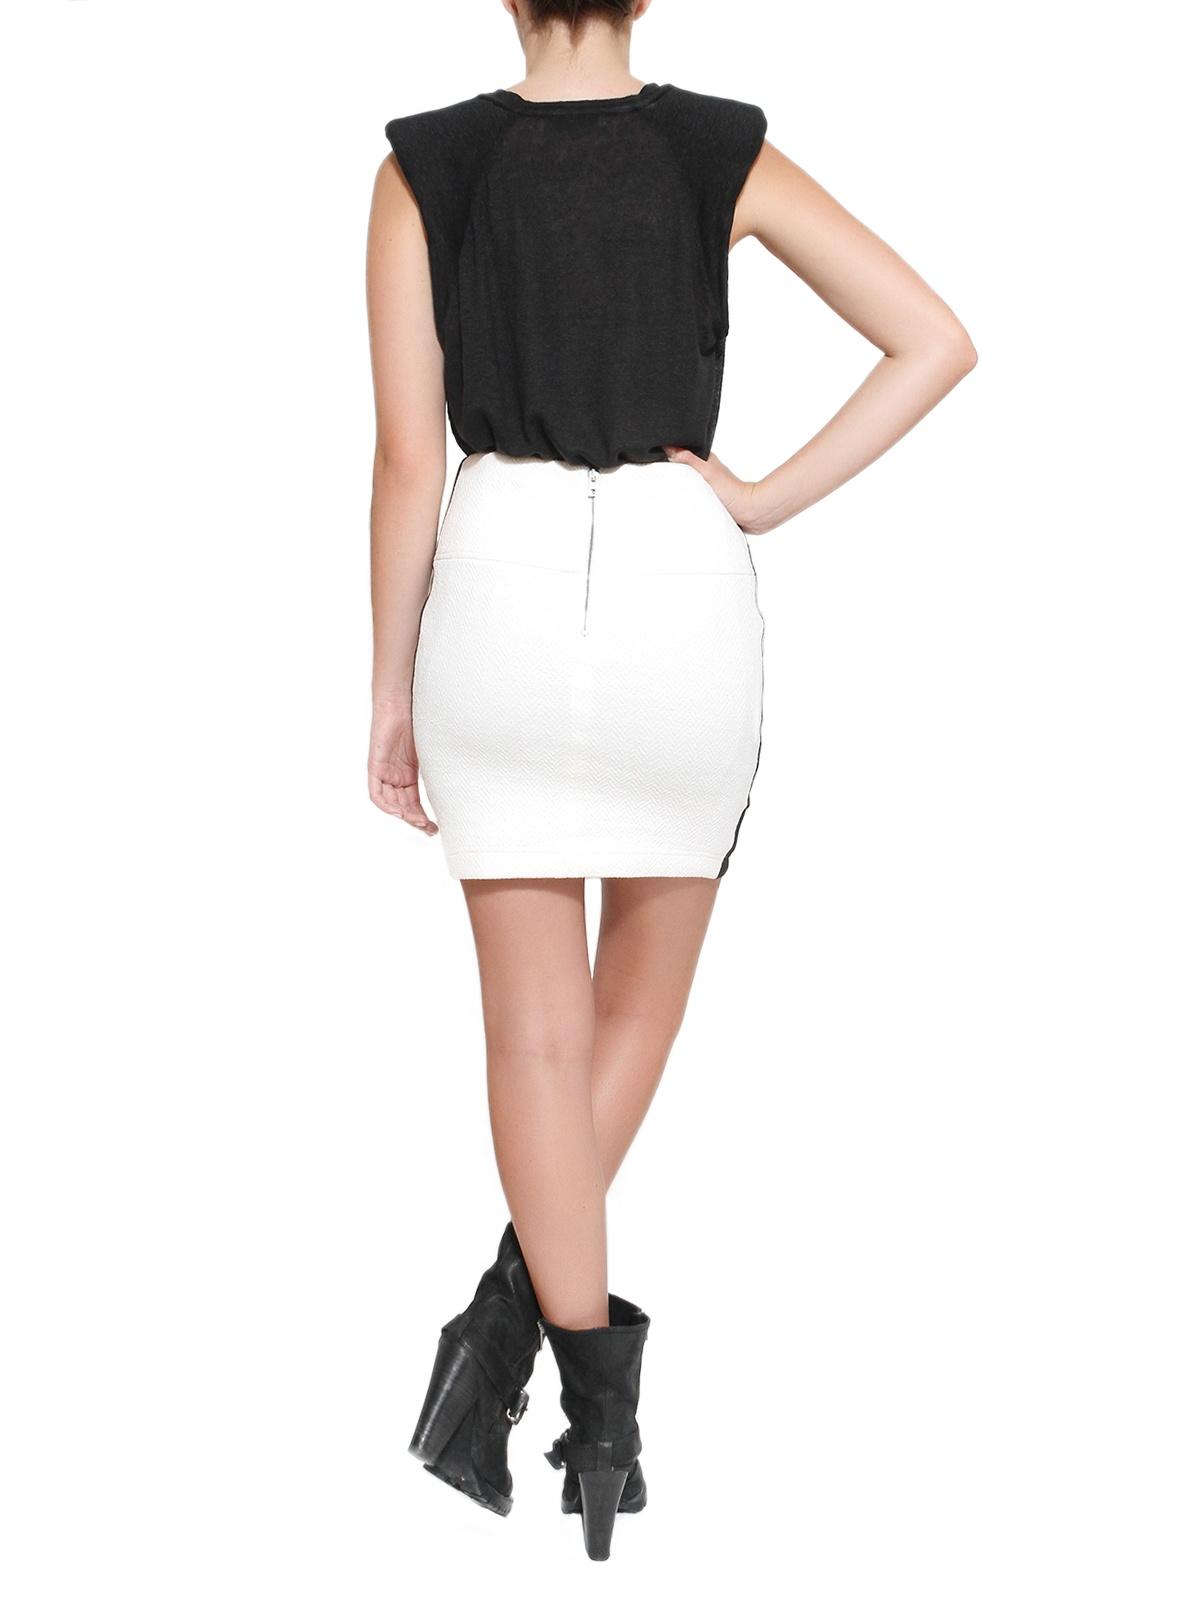 DAULA BLACK TOP | GIRISSIMA.COM - Collectible fashion to love and to last